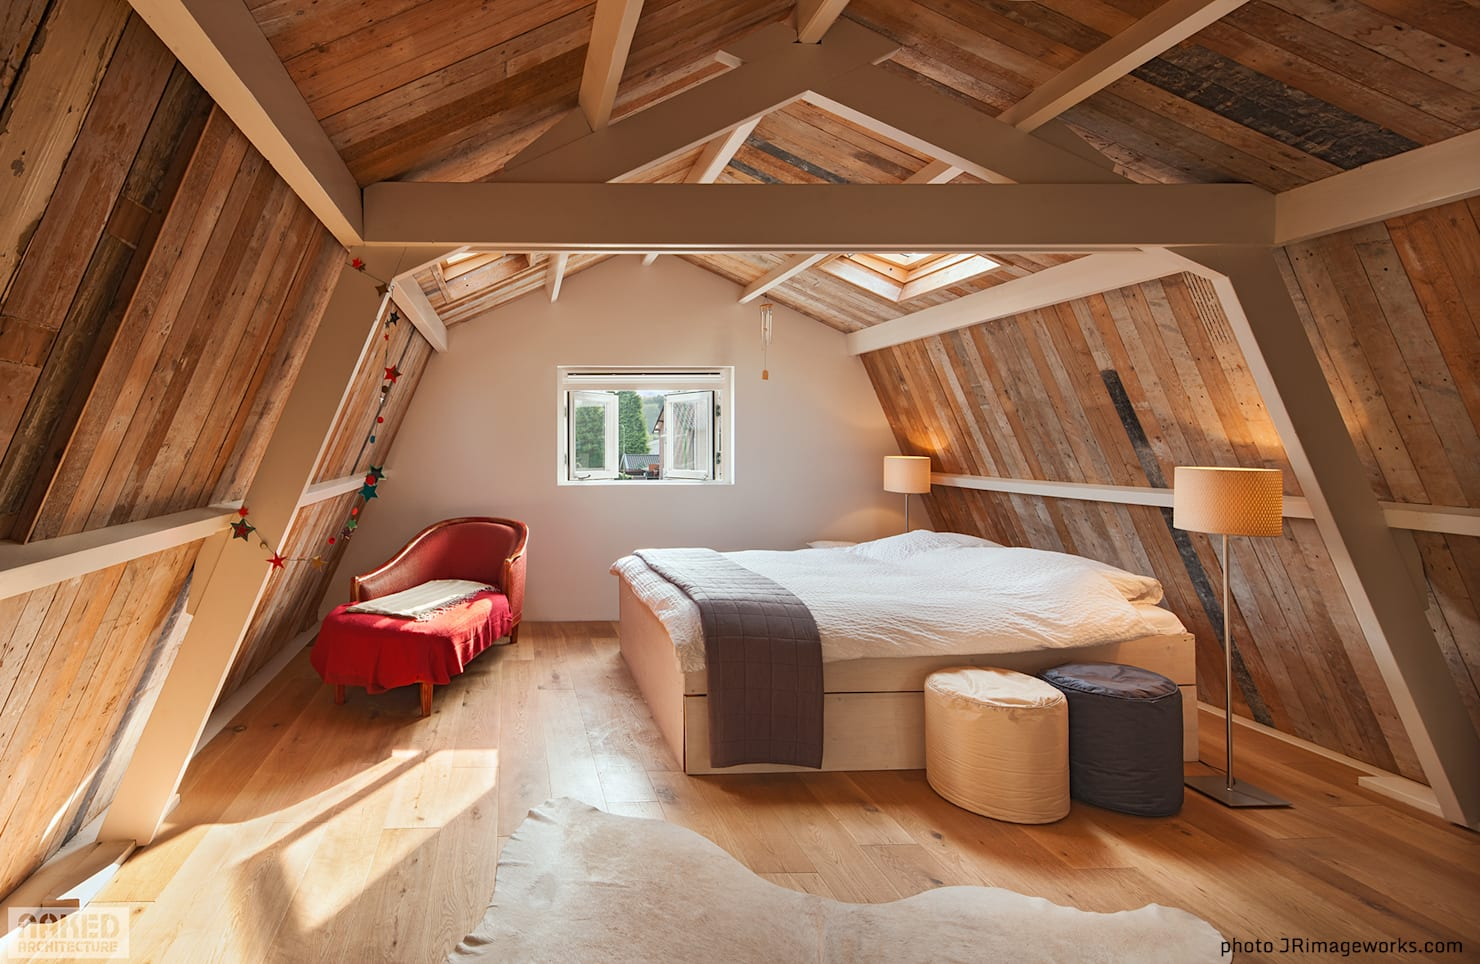 5 rustic bedroom ideas